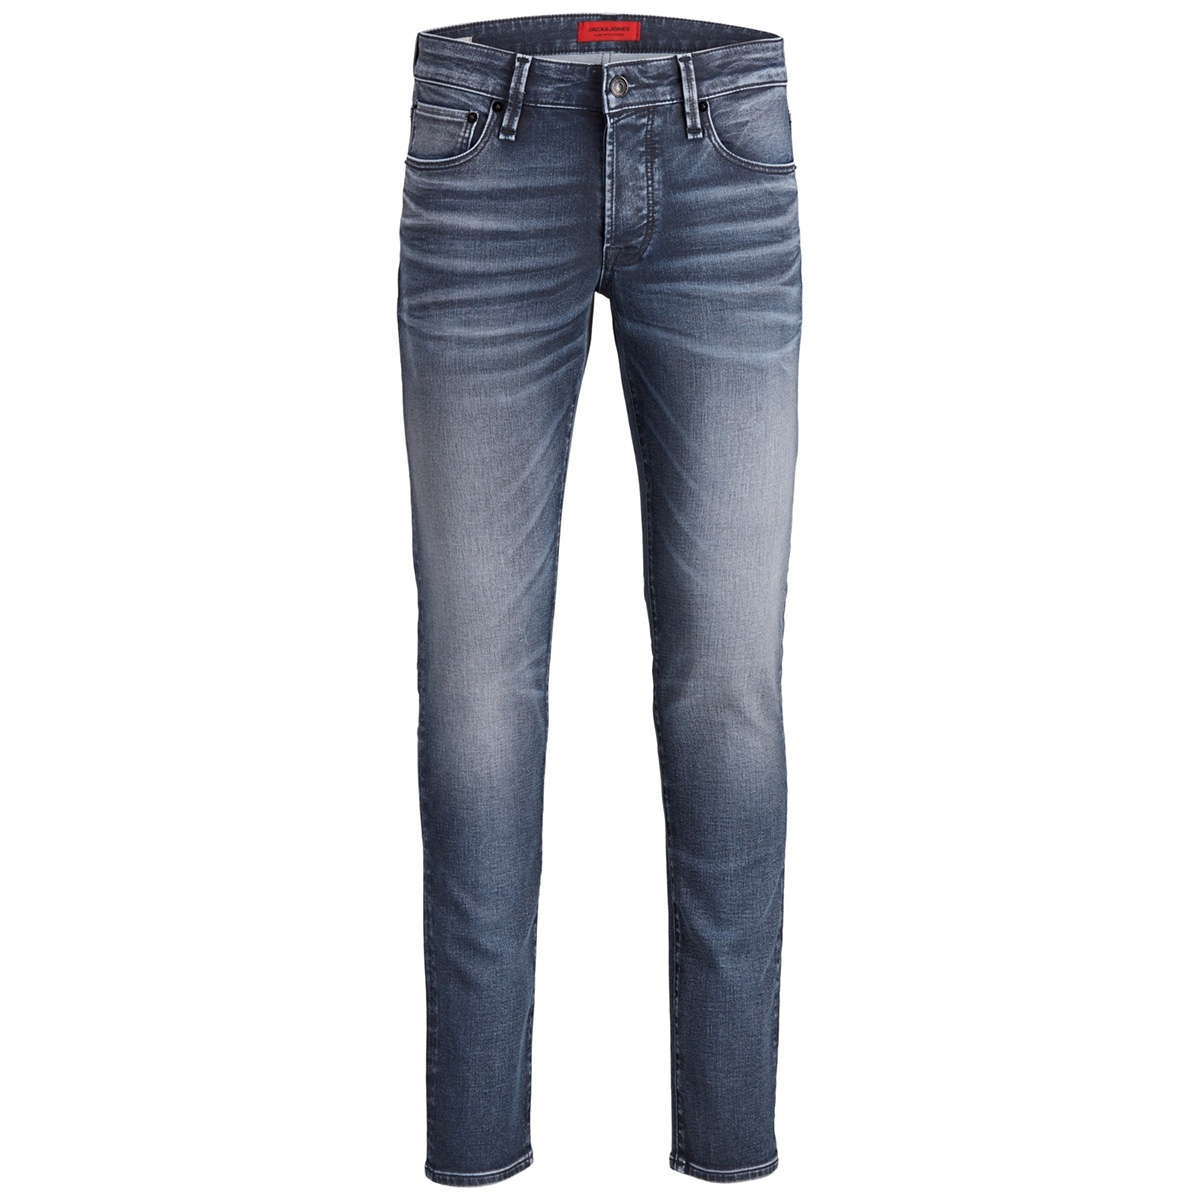 jjiglenn jjoriginal jos 801 i.k jack & jones jeans blue denim